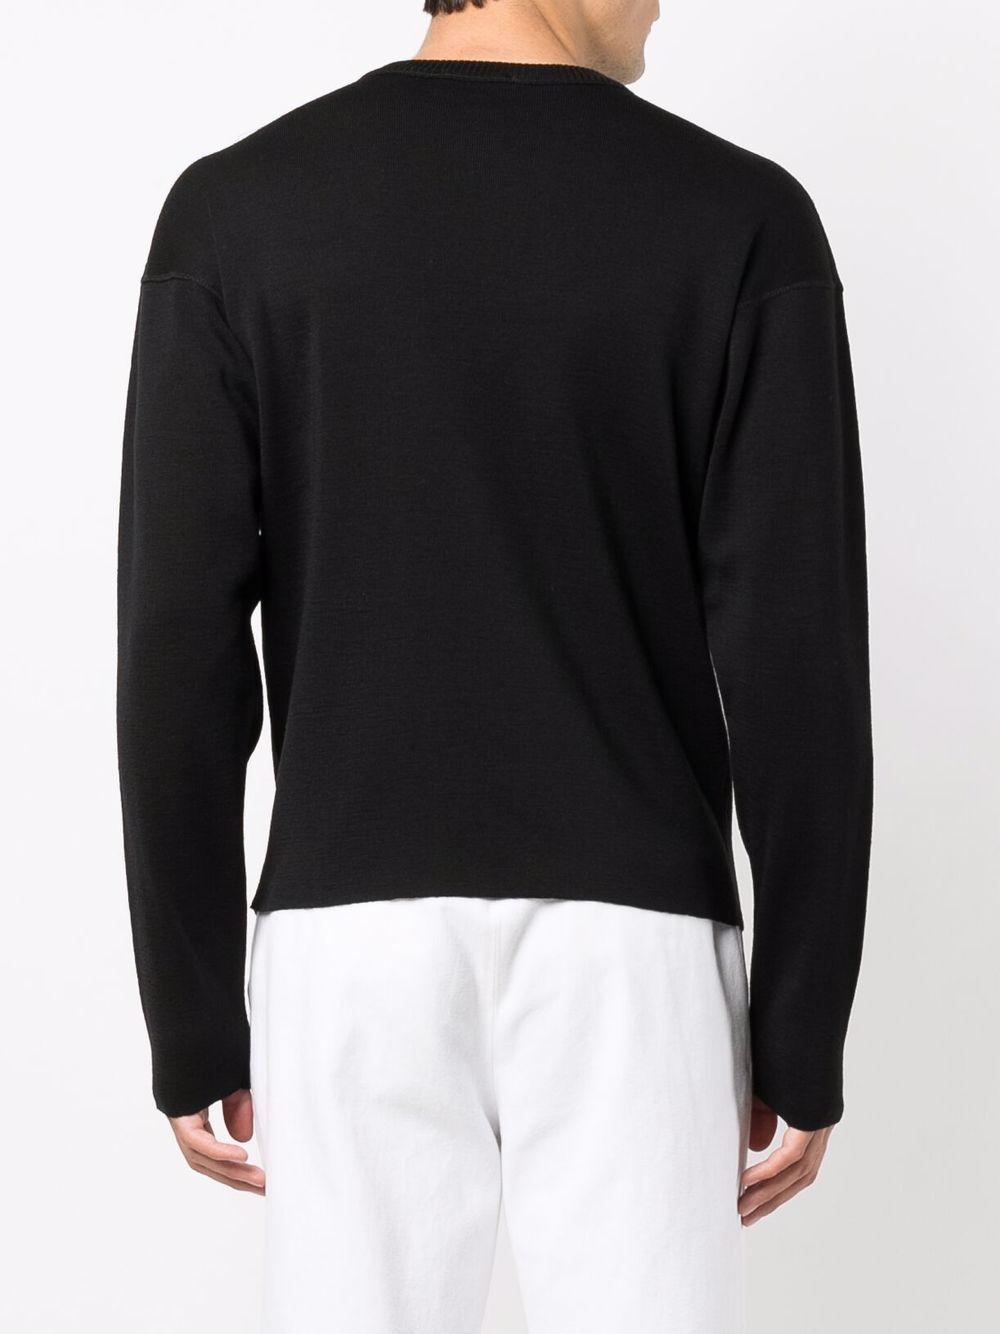 wool blend seeatshirt man black LEMAIRE | Sweatshirts | M 213 KN320 LK087999